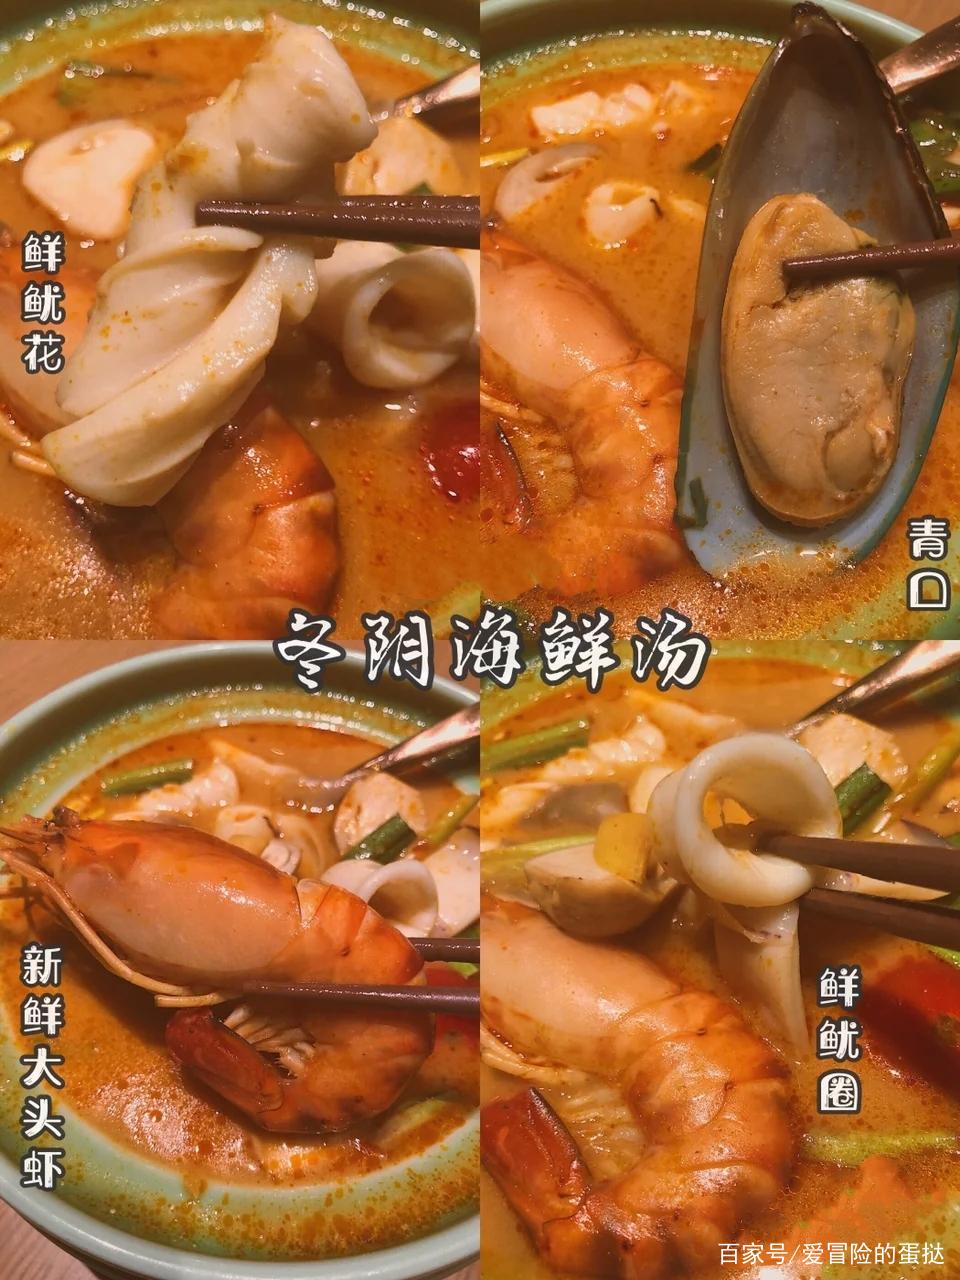 Mango tree芒果树餐厅广州美食广州No.1 最正宗的泰国菜